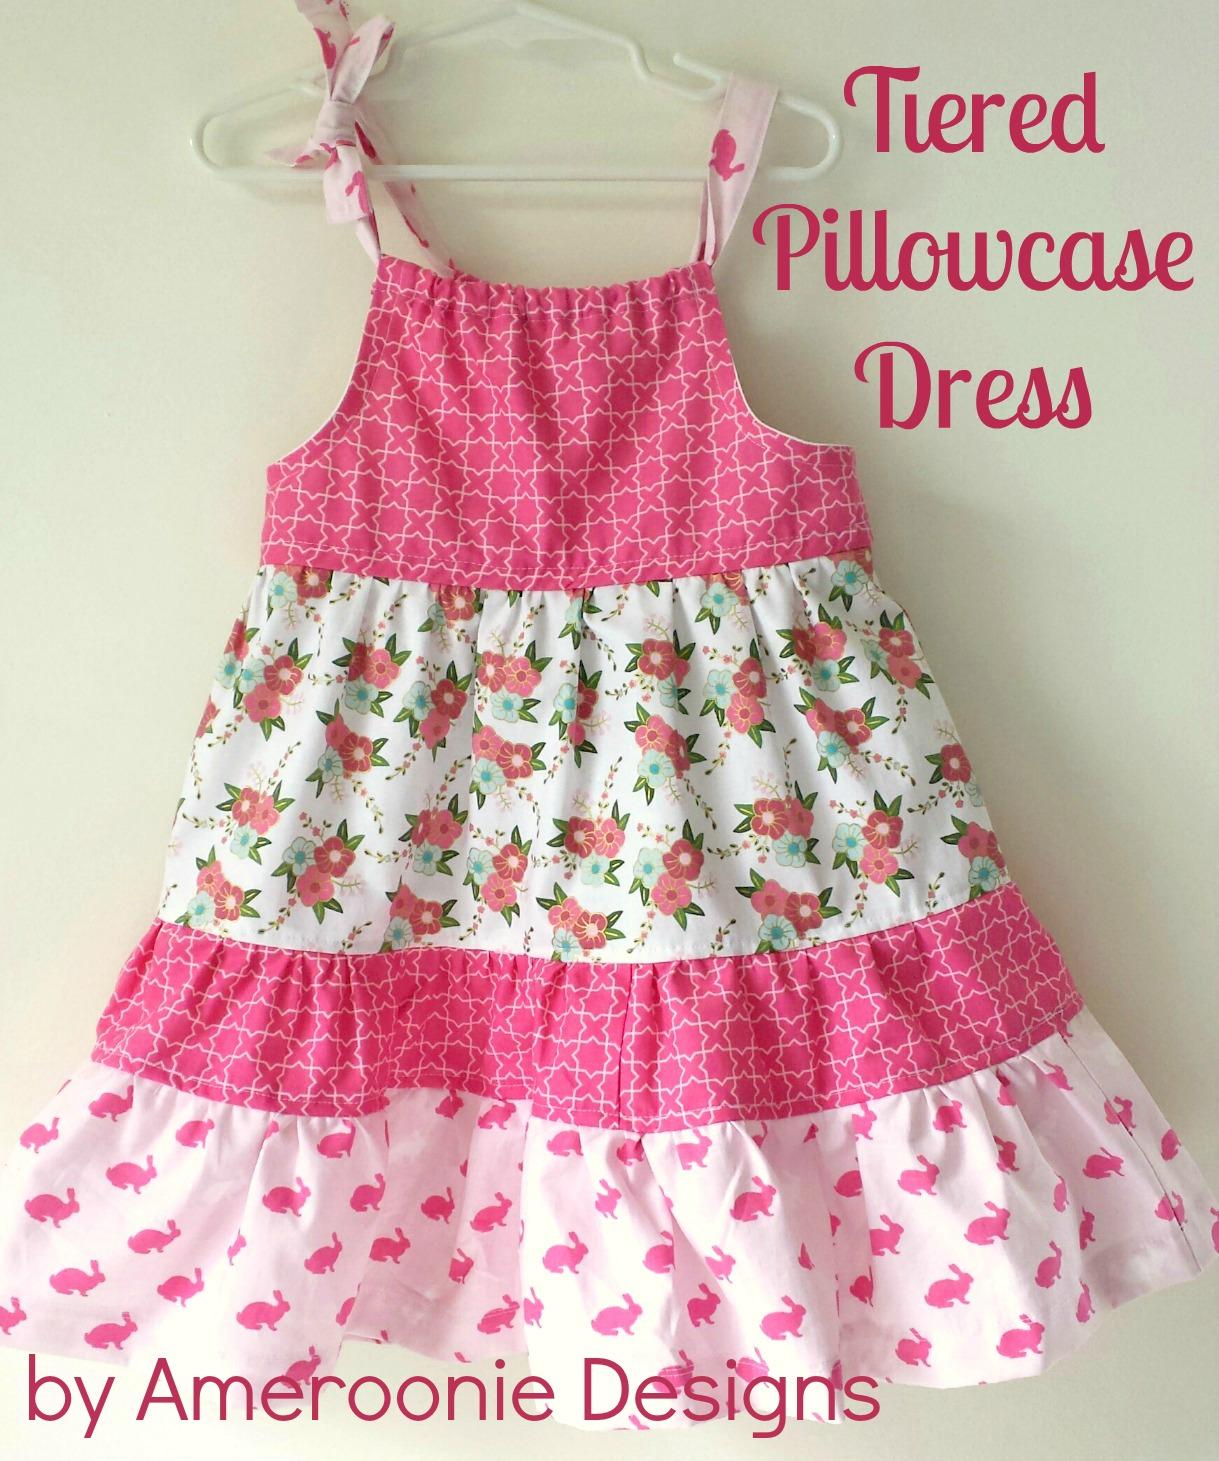 e60f3481b Ameroonie Designs  Wonderland Tiered Pillowcase Dress